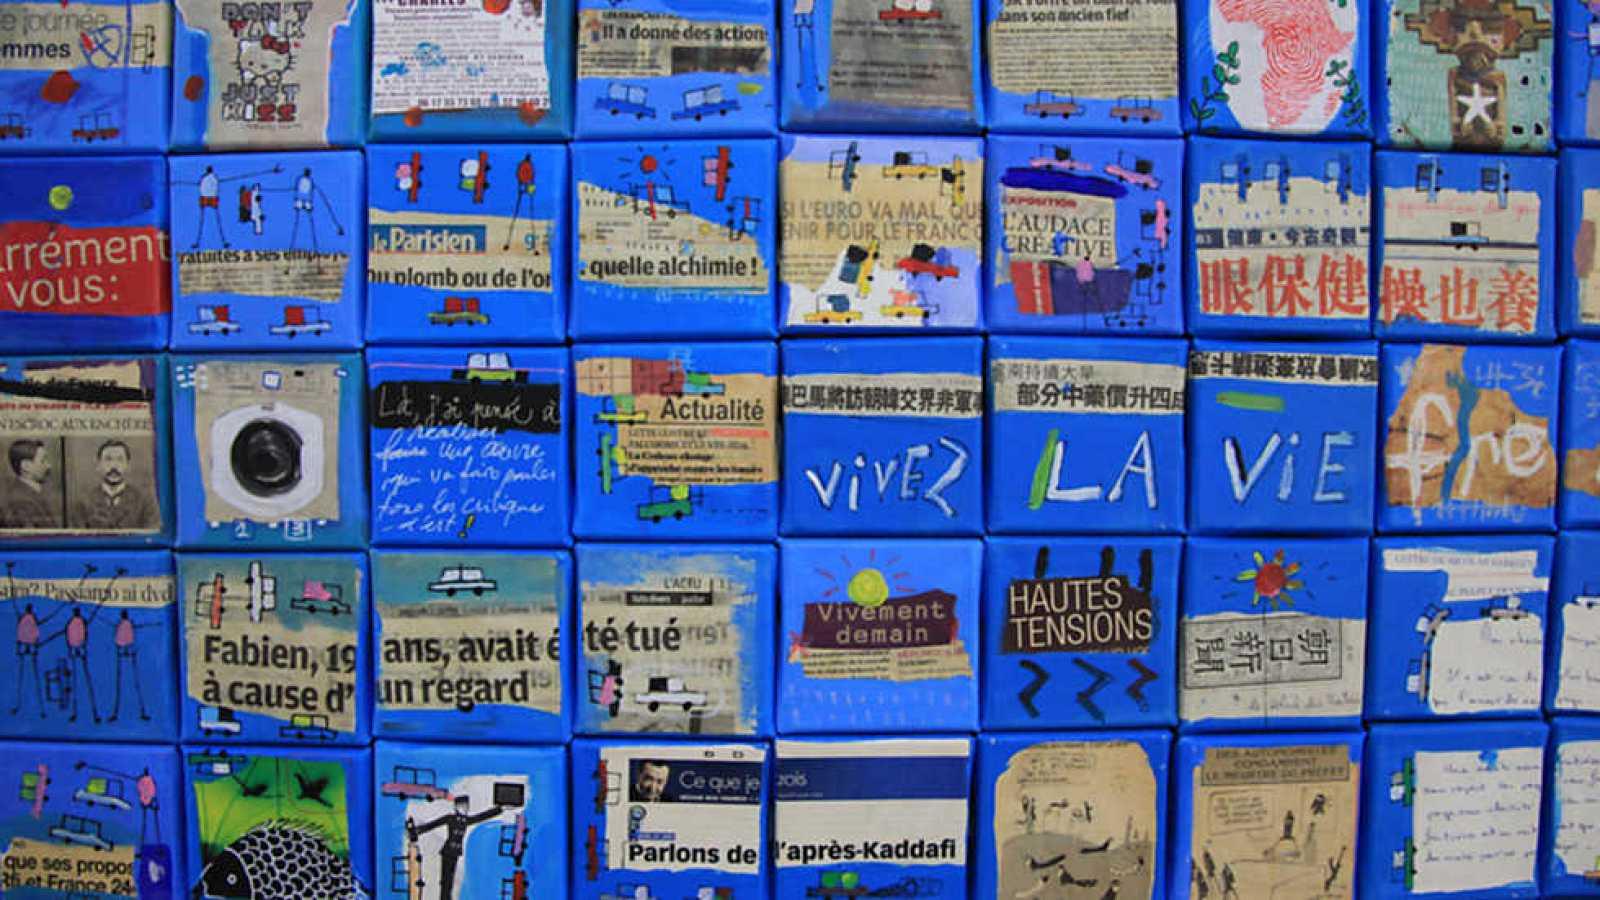 Metrópolis - Dak'art 2016 (I): Reencantamiento - ver ahora